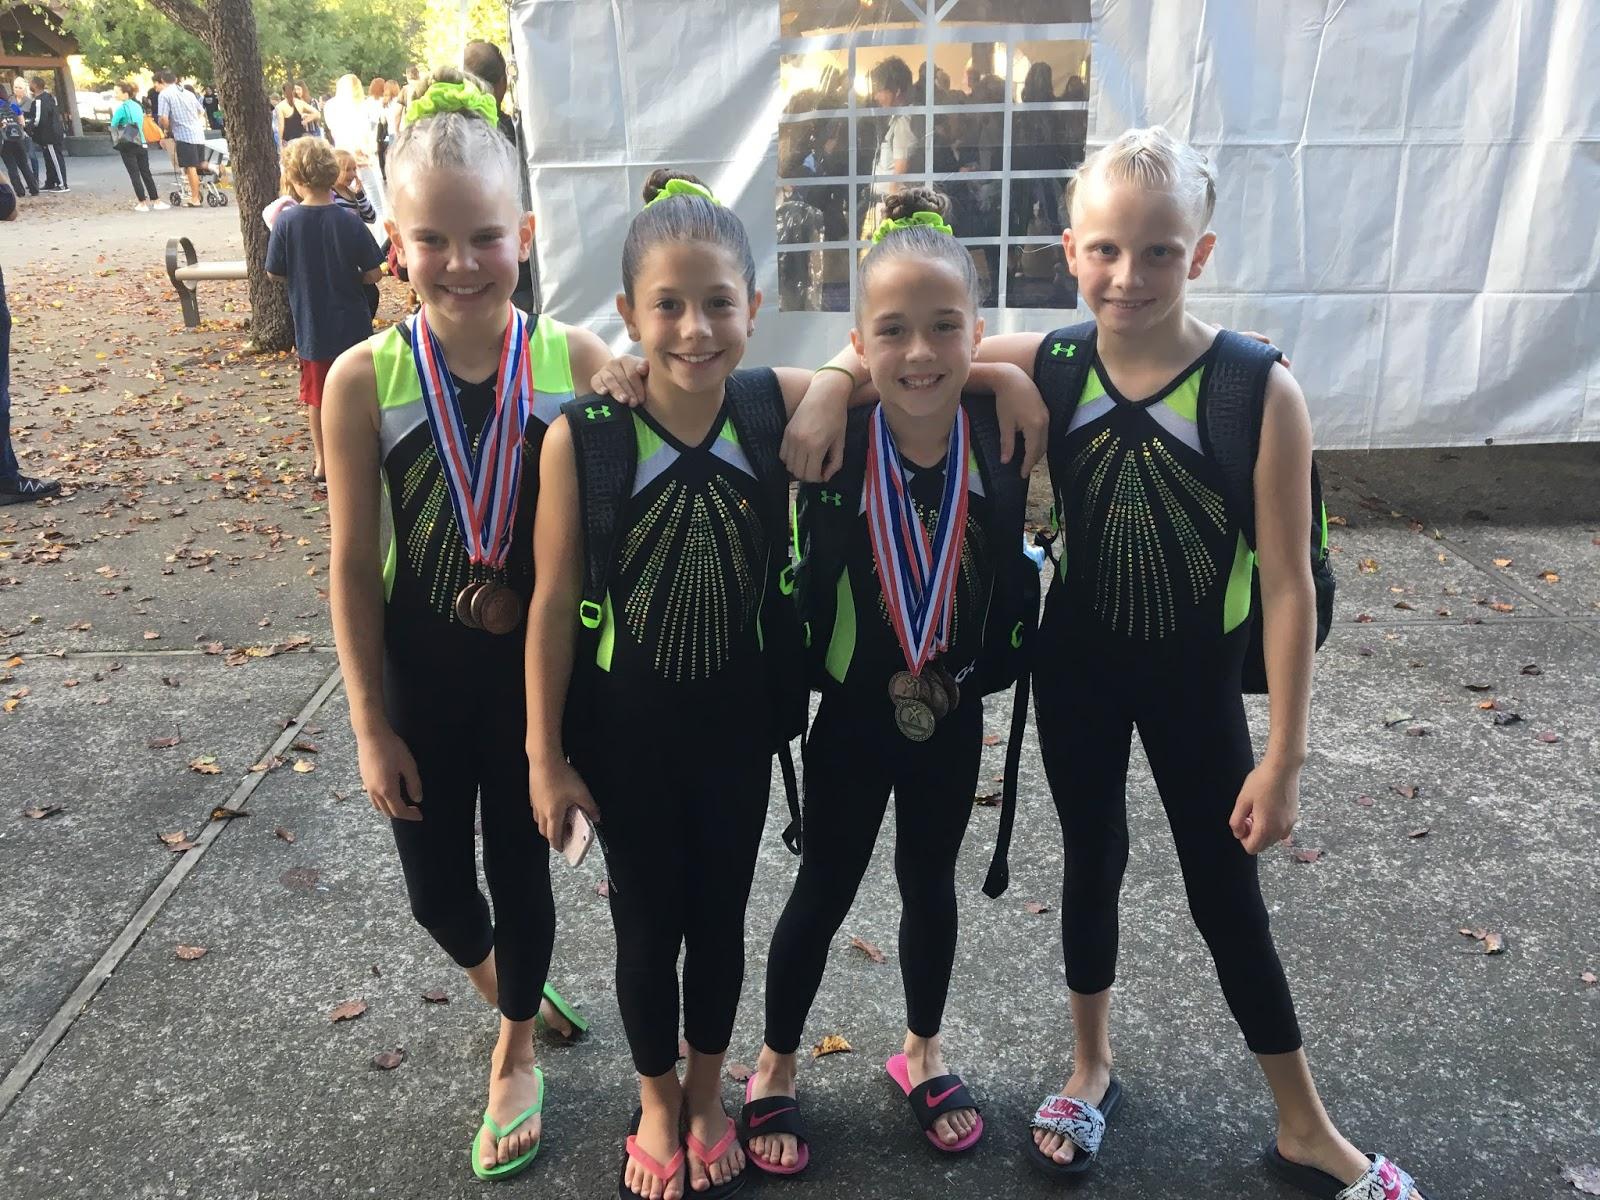 Winwin gymnastics - Napa Gymnast Brings Home State Championship